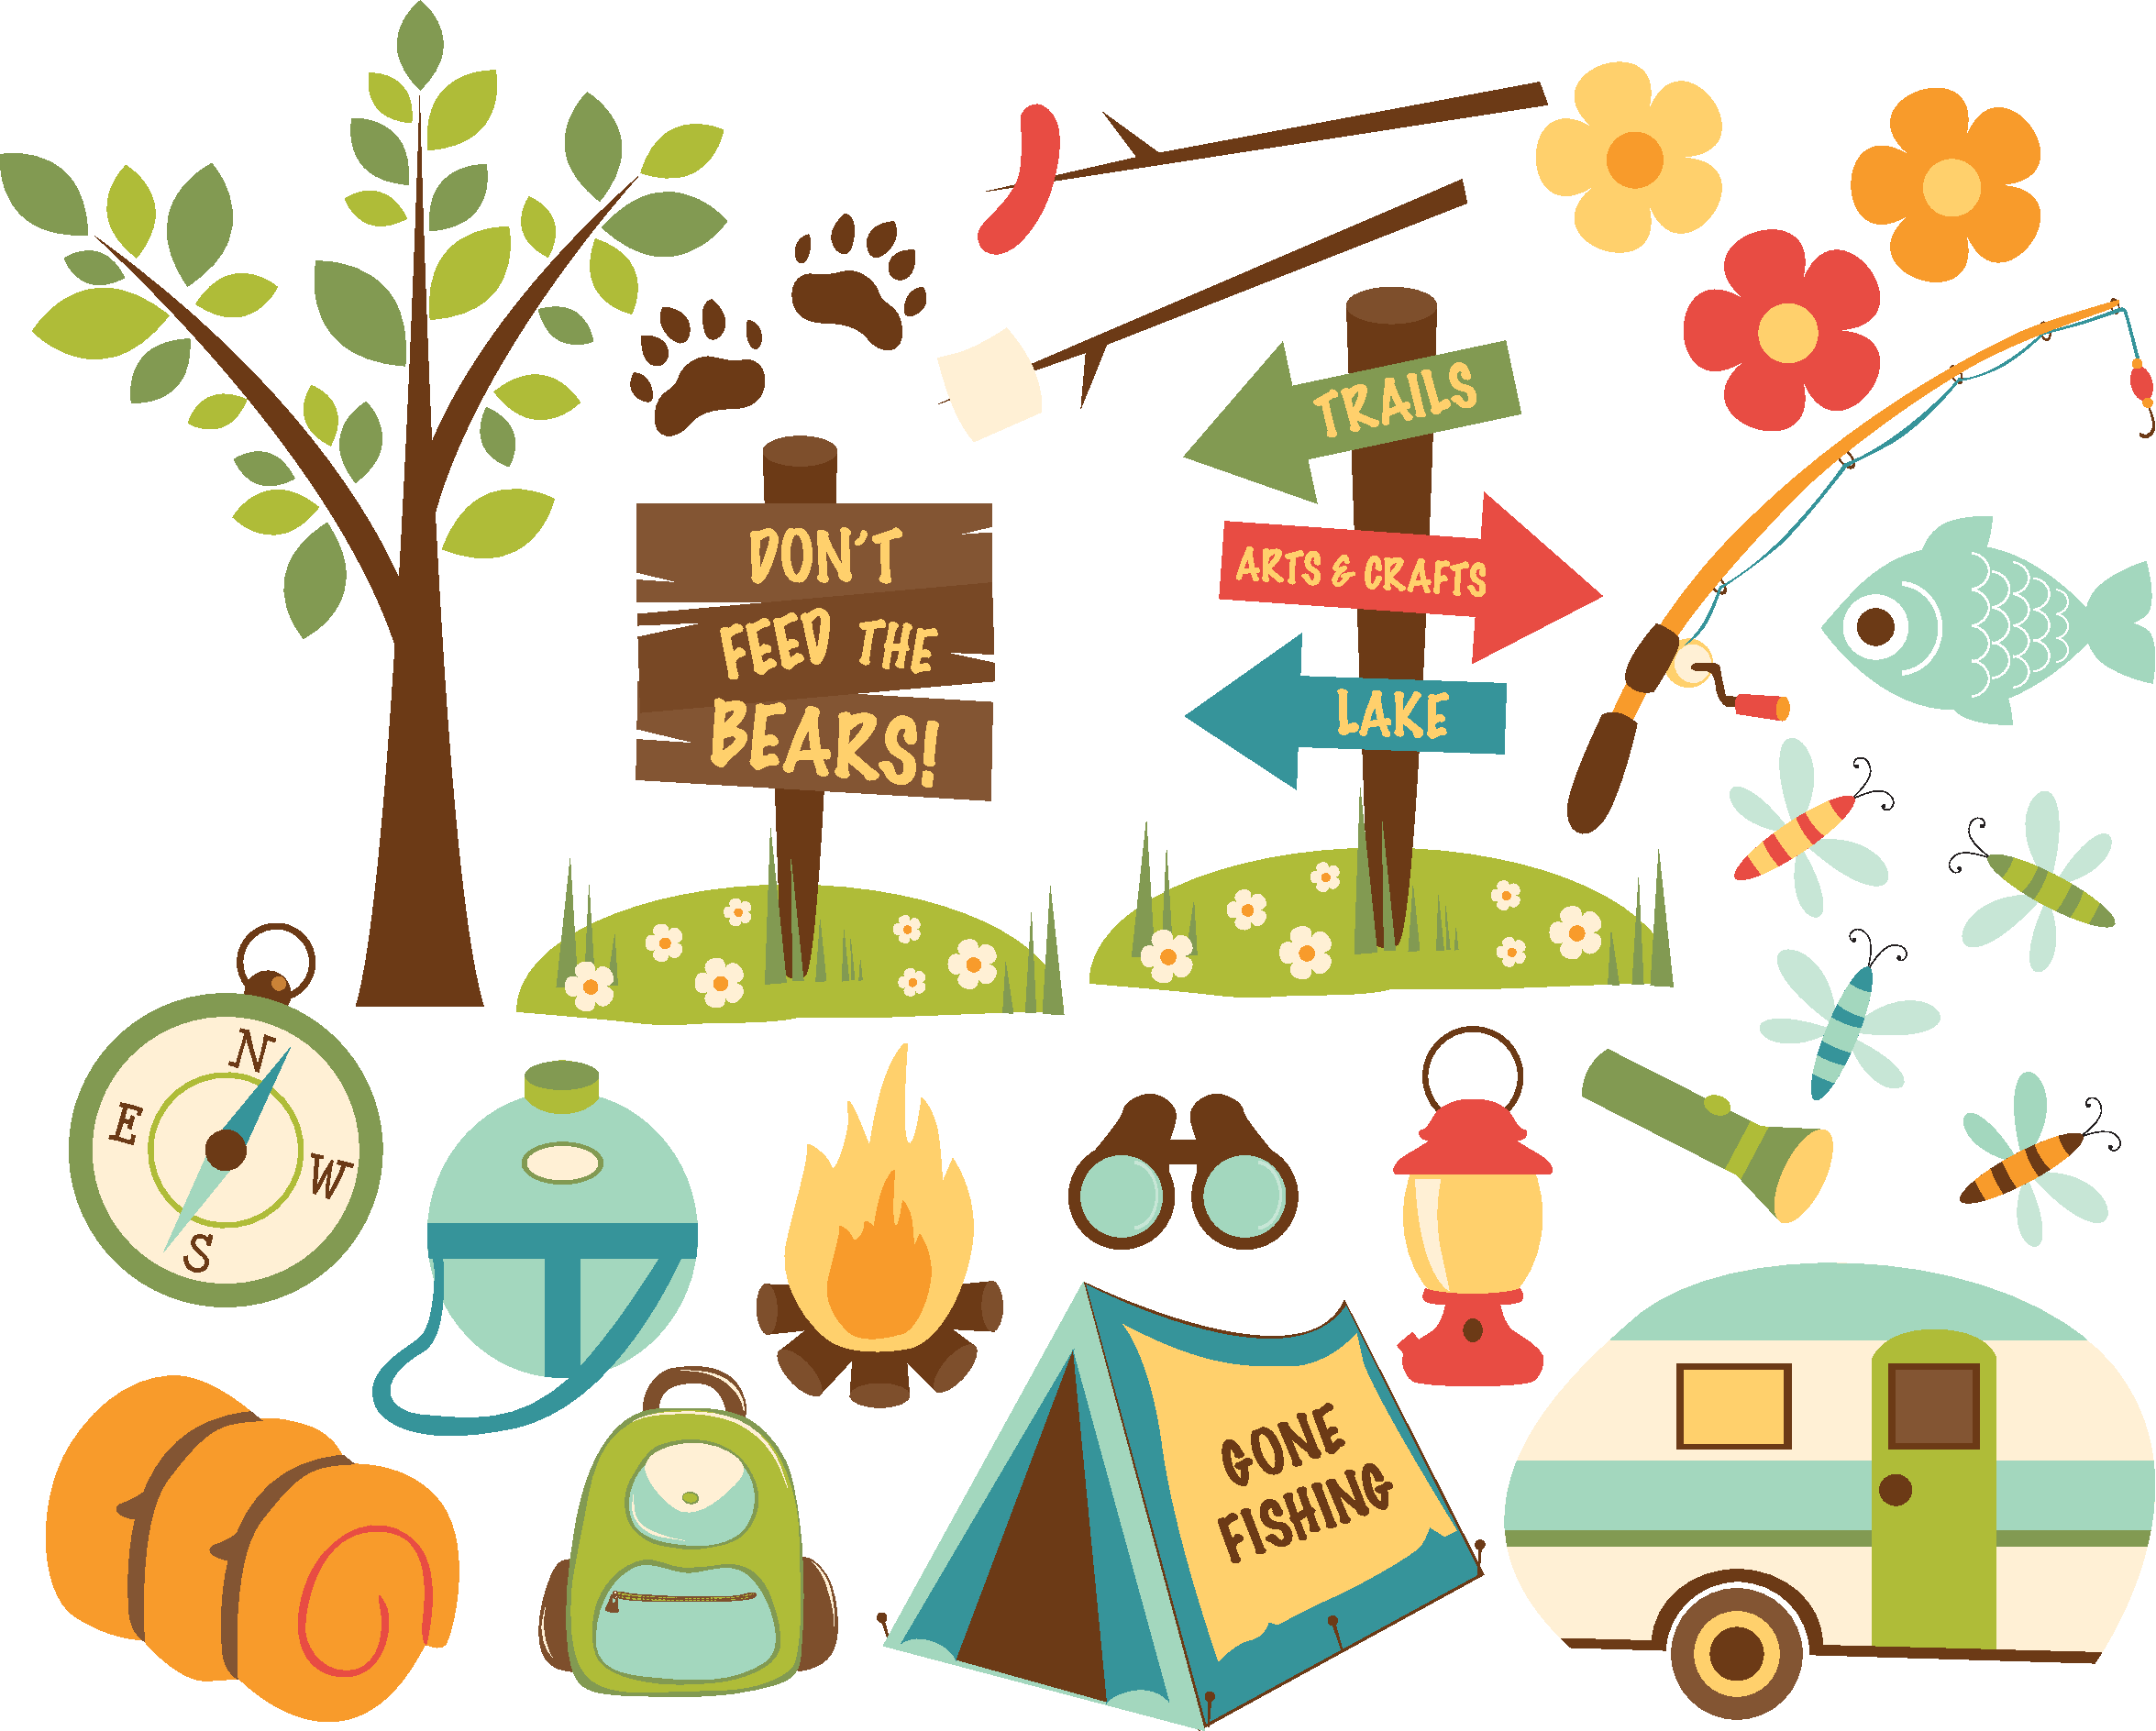 Lamina motivos acampada